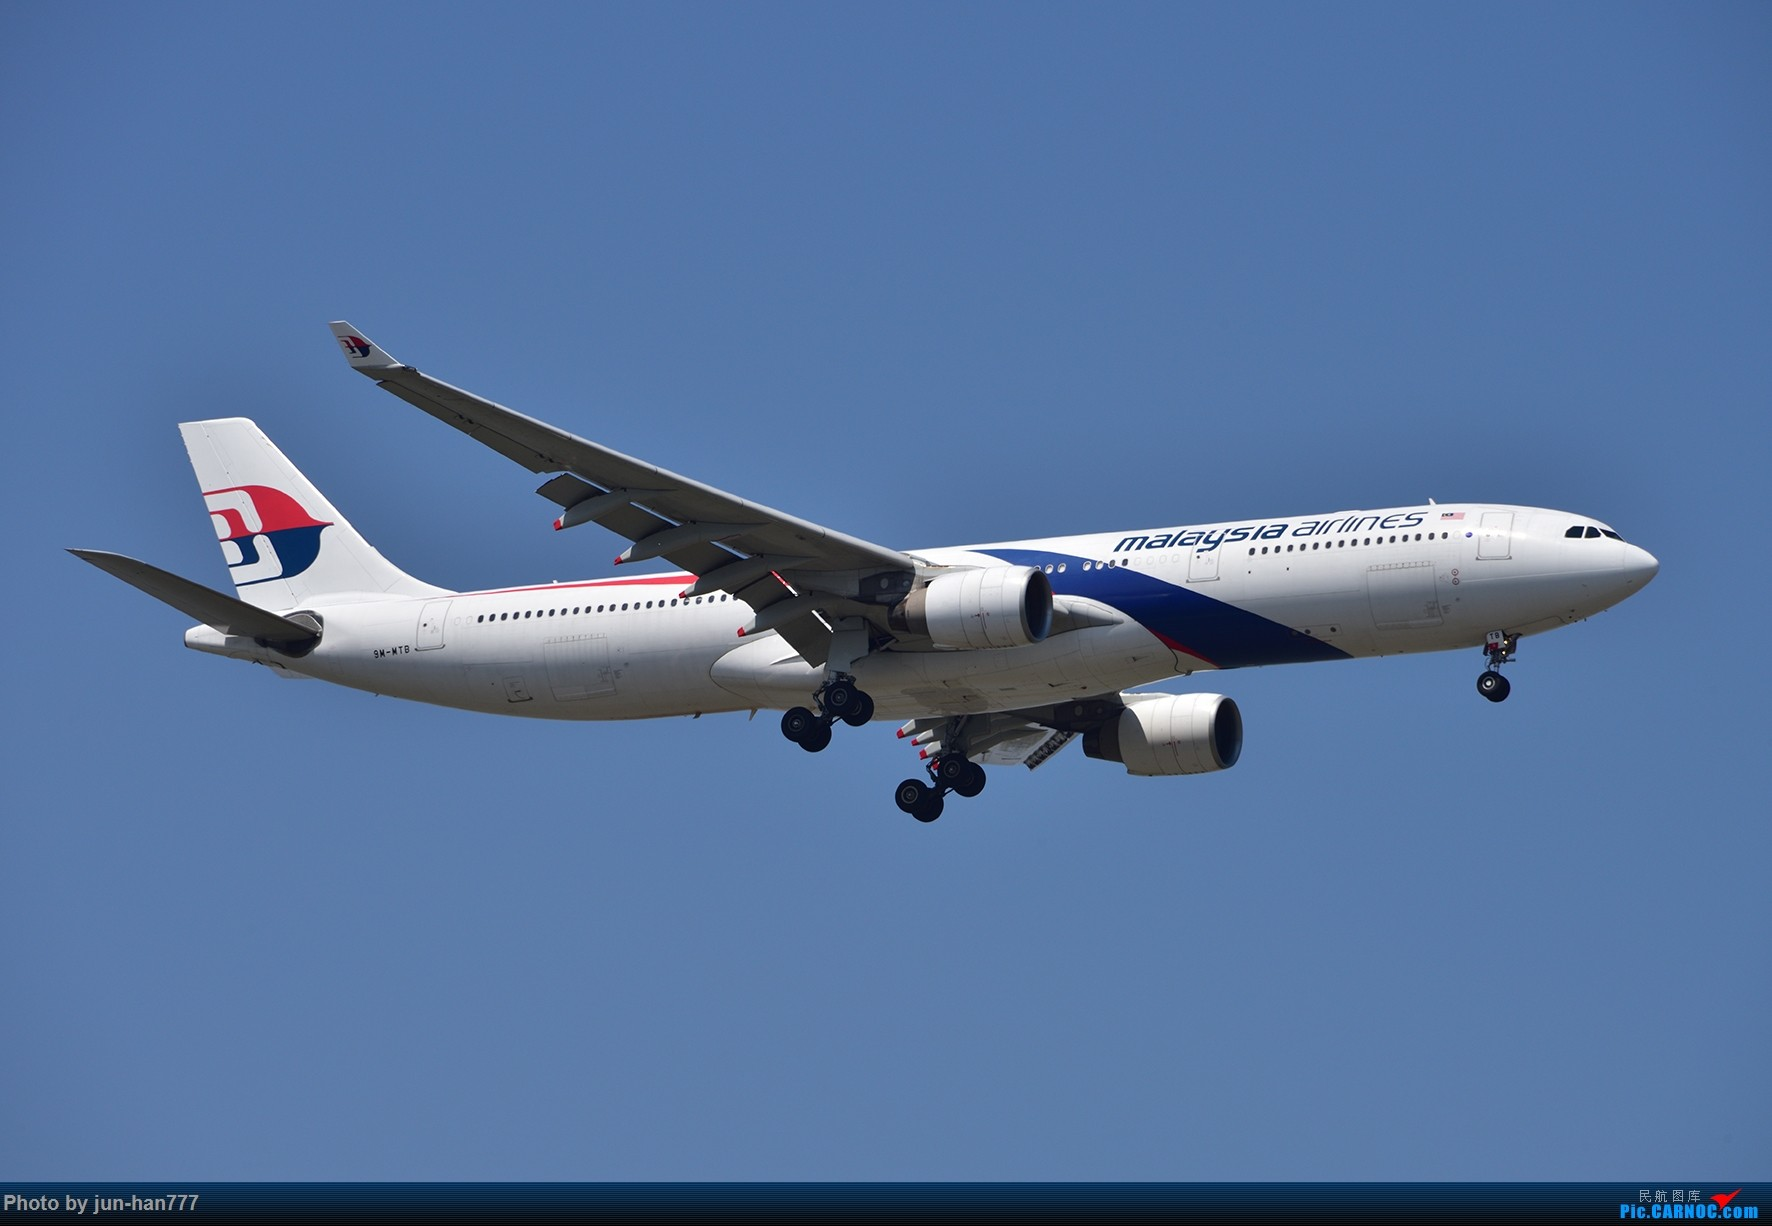 Re:[原创]PVG 晴朗的天空,靓丽的大鸟 AIRBUS A330